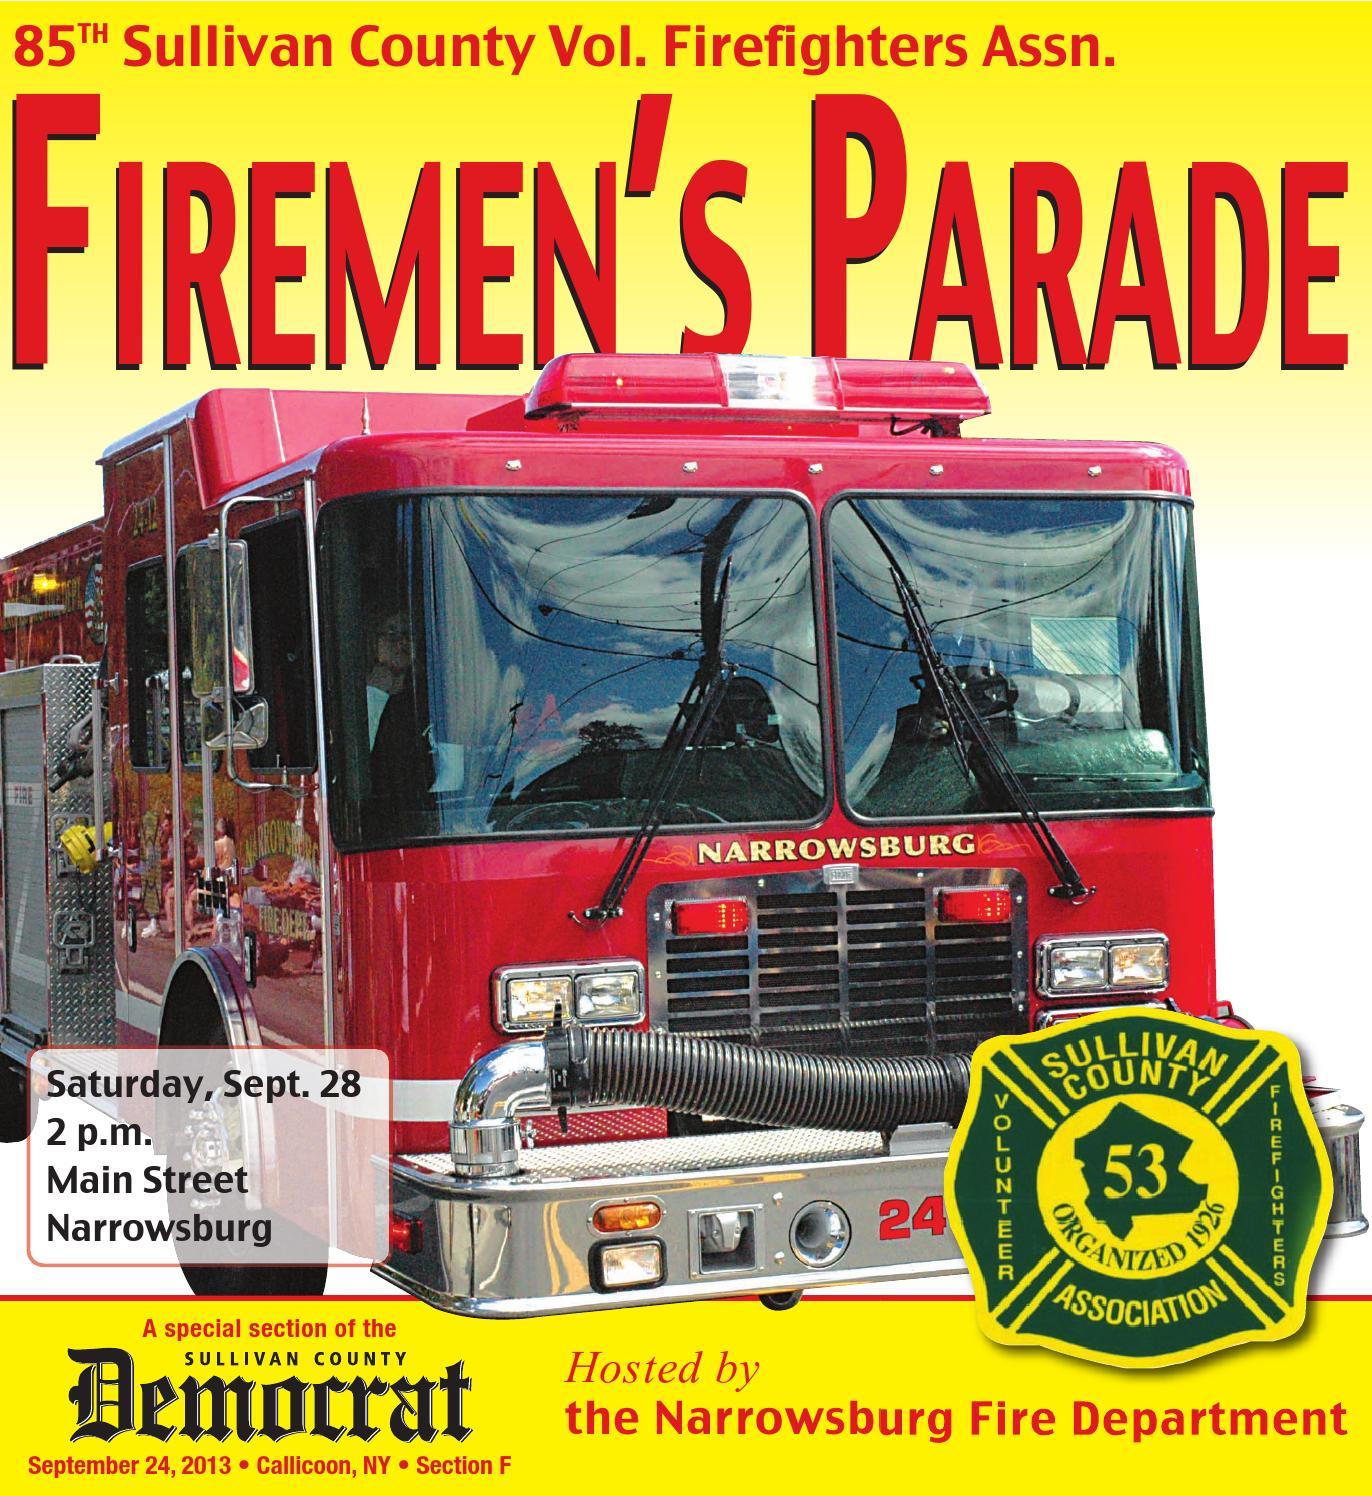 Department Of Motor Vehicles Huntington Ny: Sullivan County Firefighters Parade 2013 By Sullivan